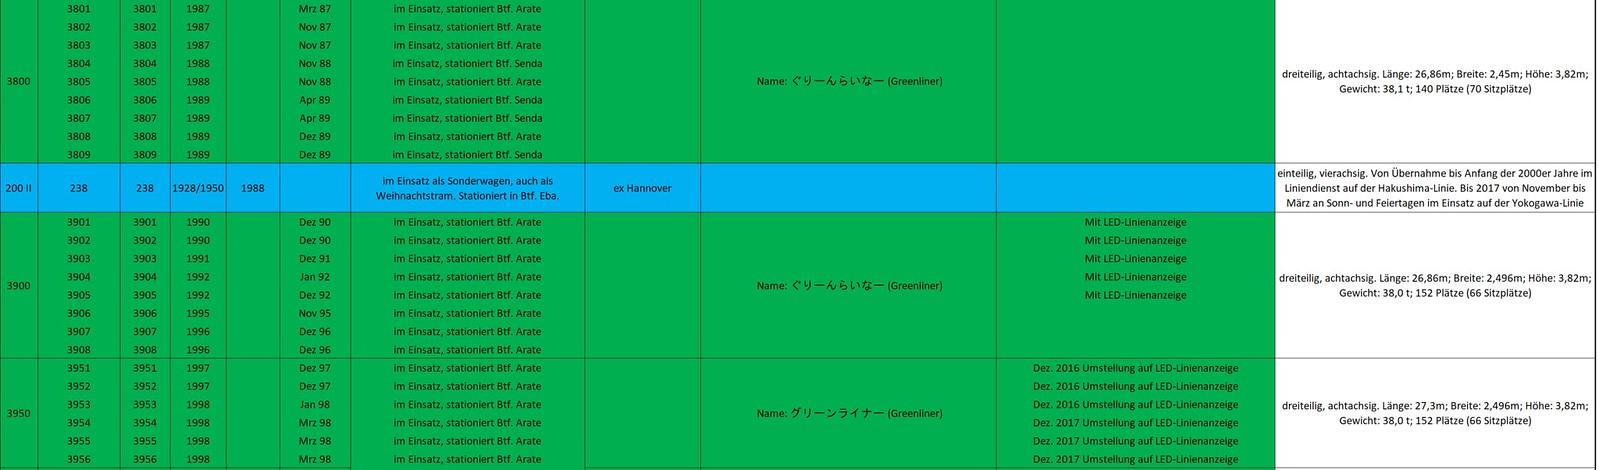 https://live.staticflickr.com/65535/50831227261_6c80c646b8_h.jpg